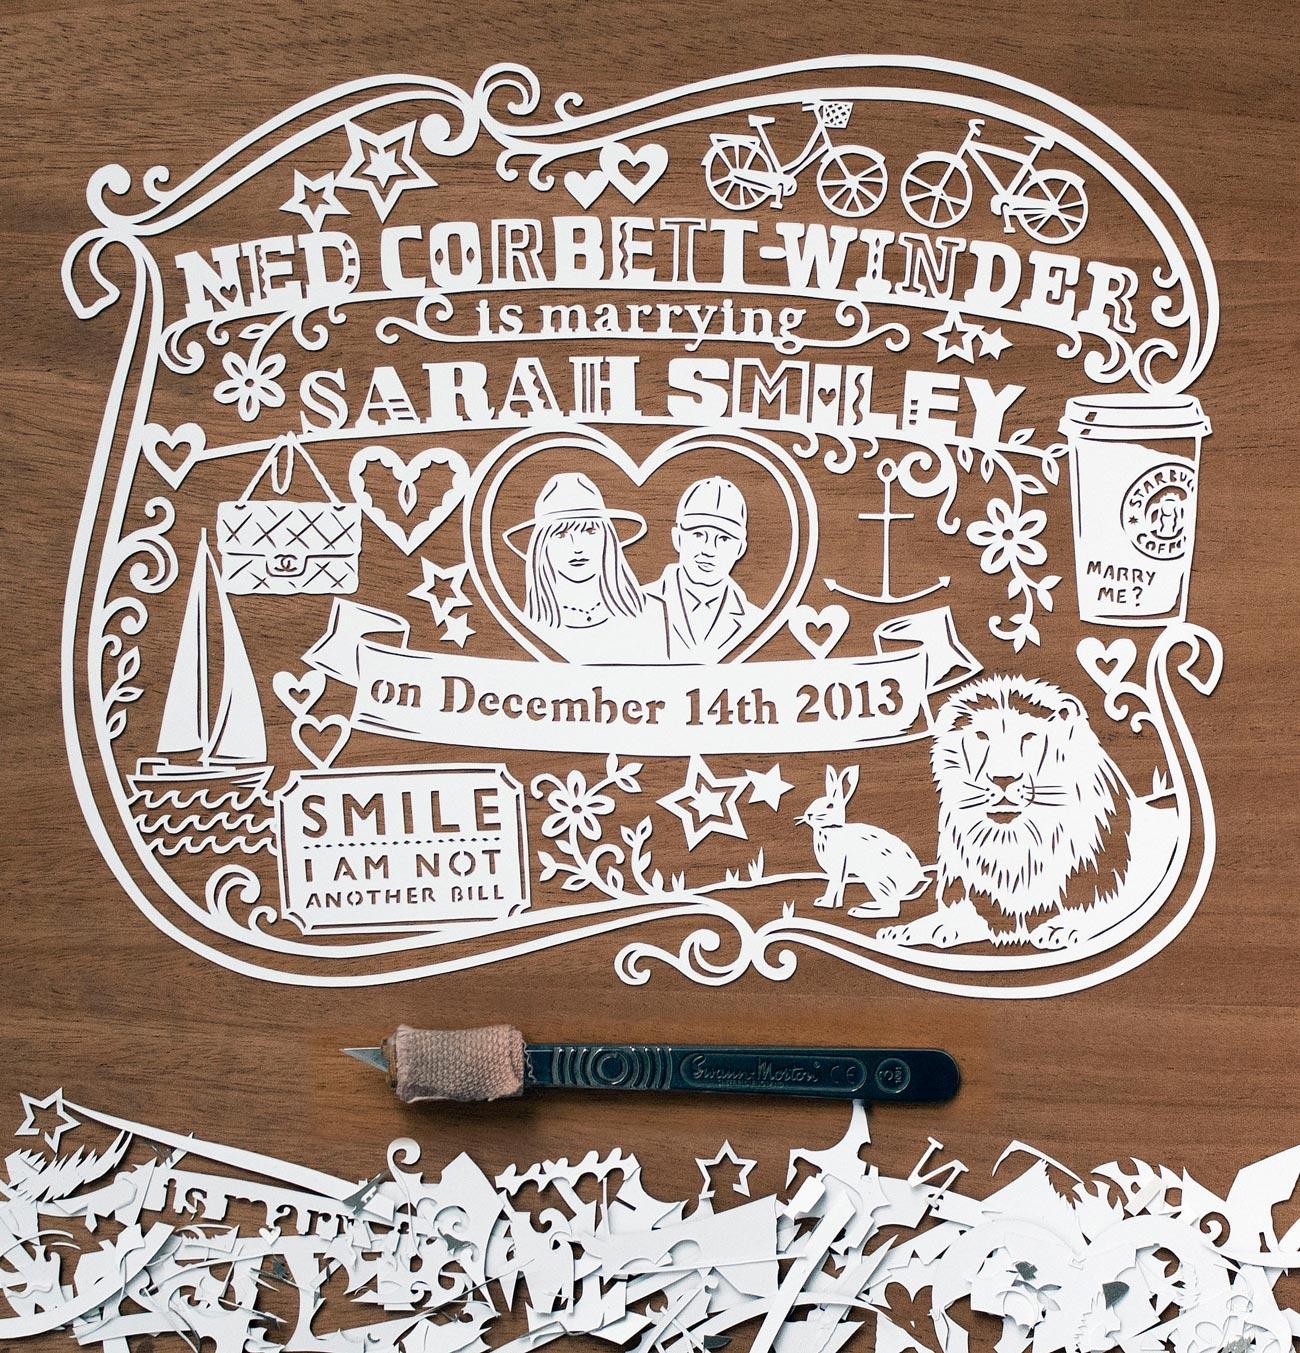 papercut illustration for anniversary, Starbucks couple love